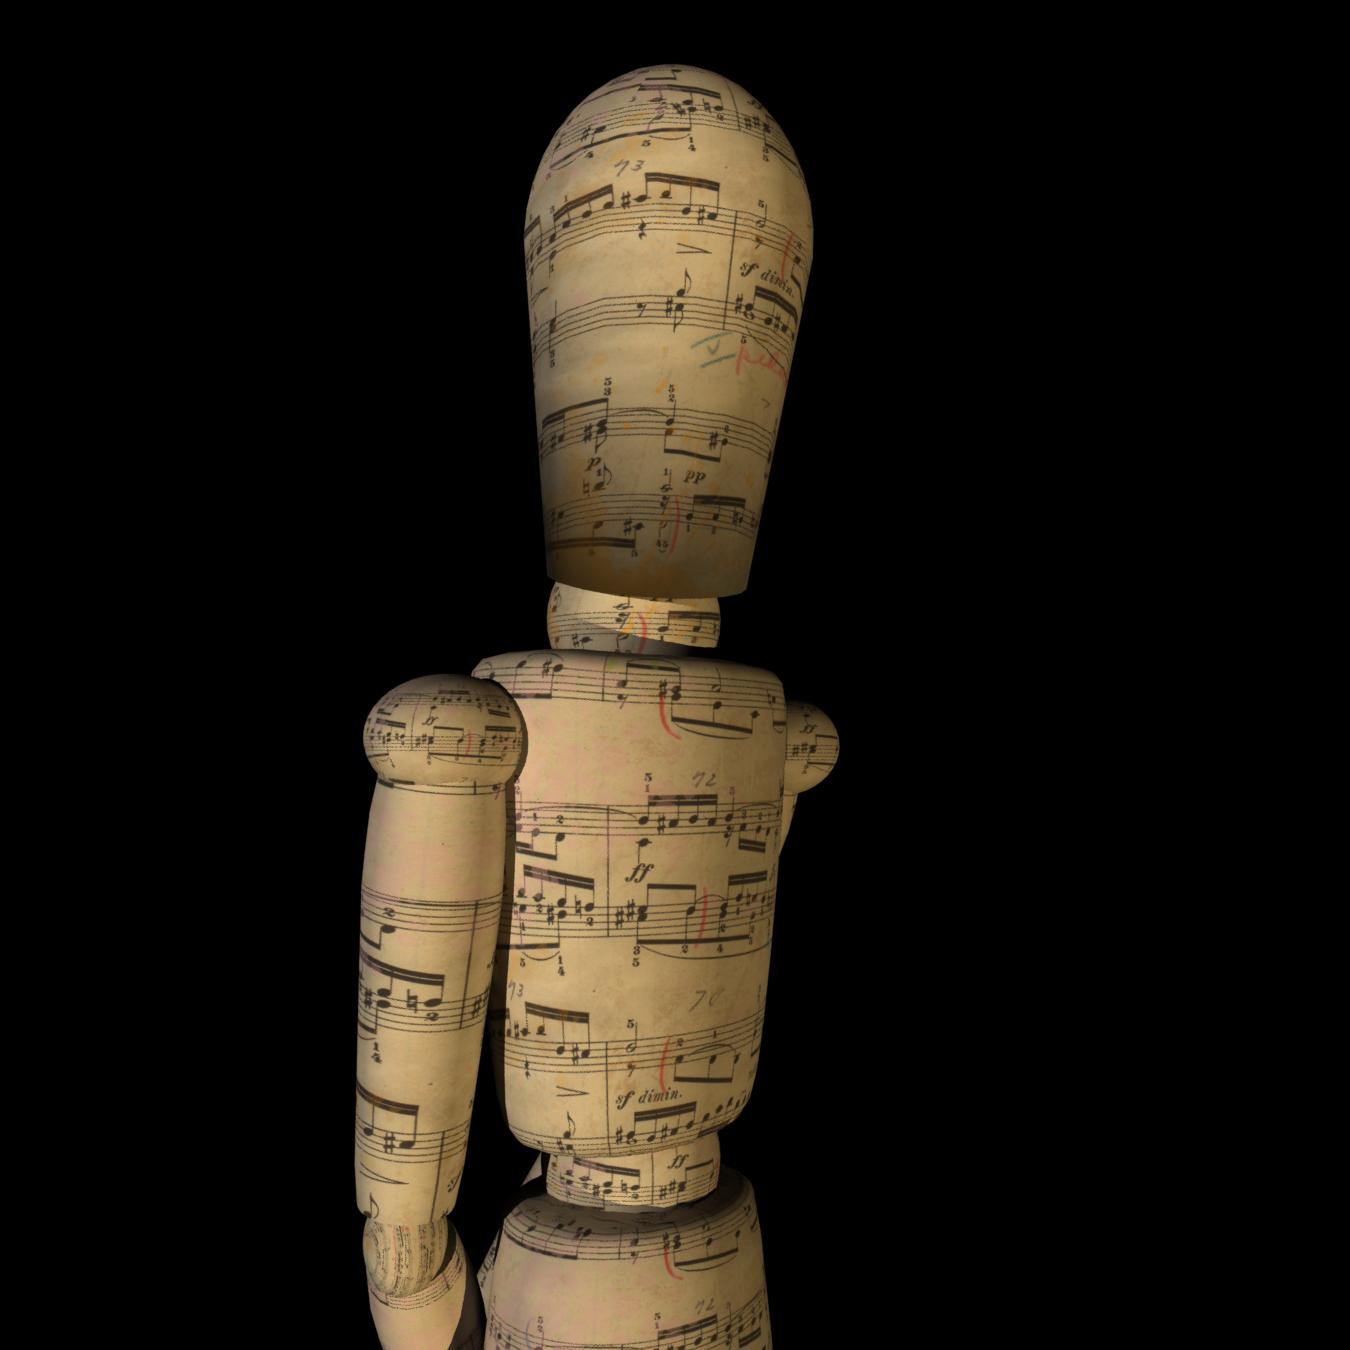 Music Dummy